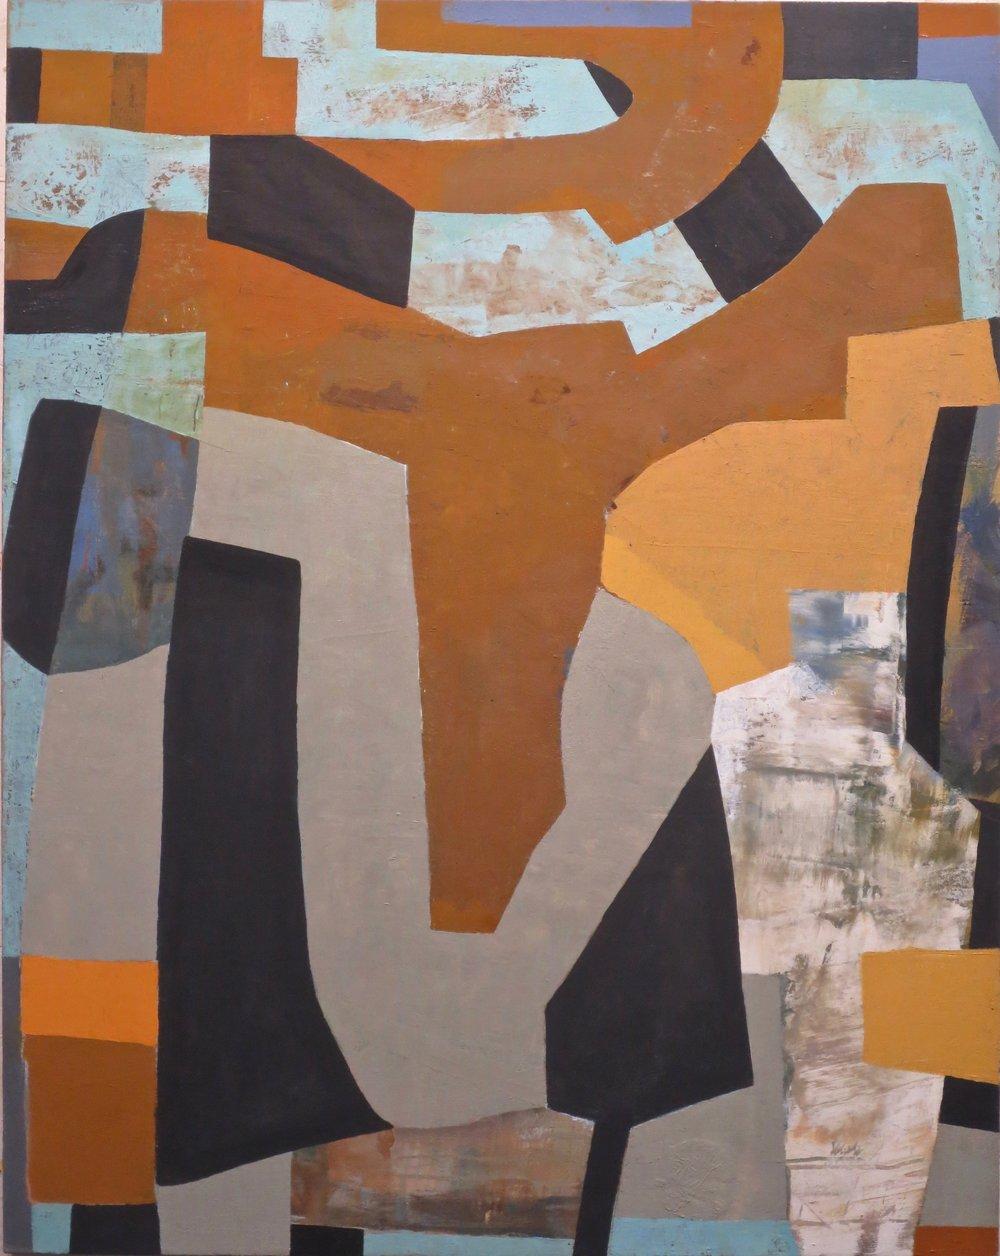 Untitled (1802), 2018